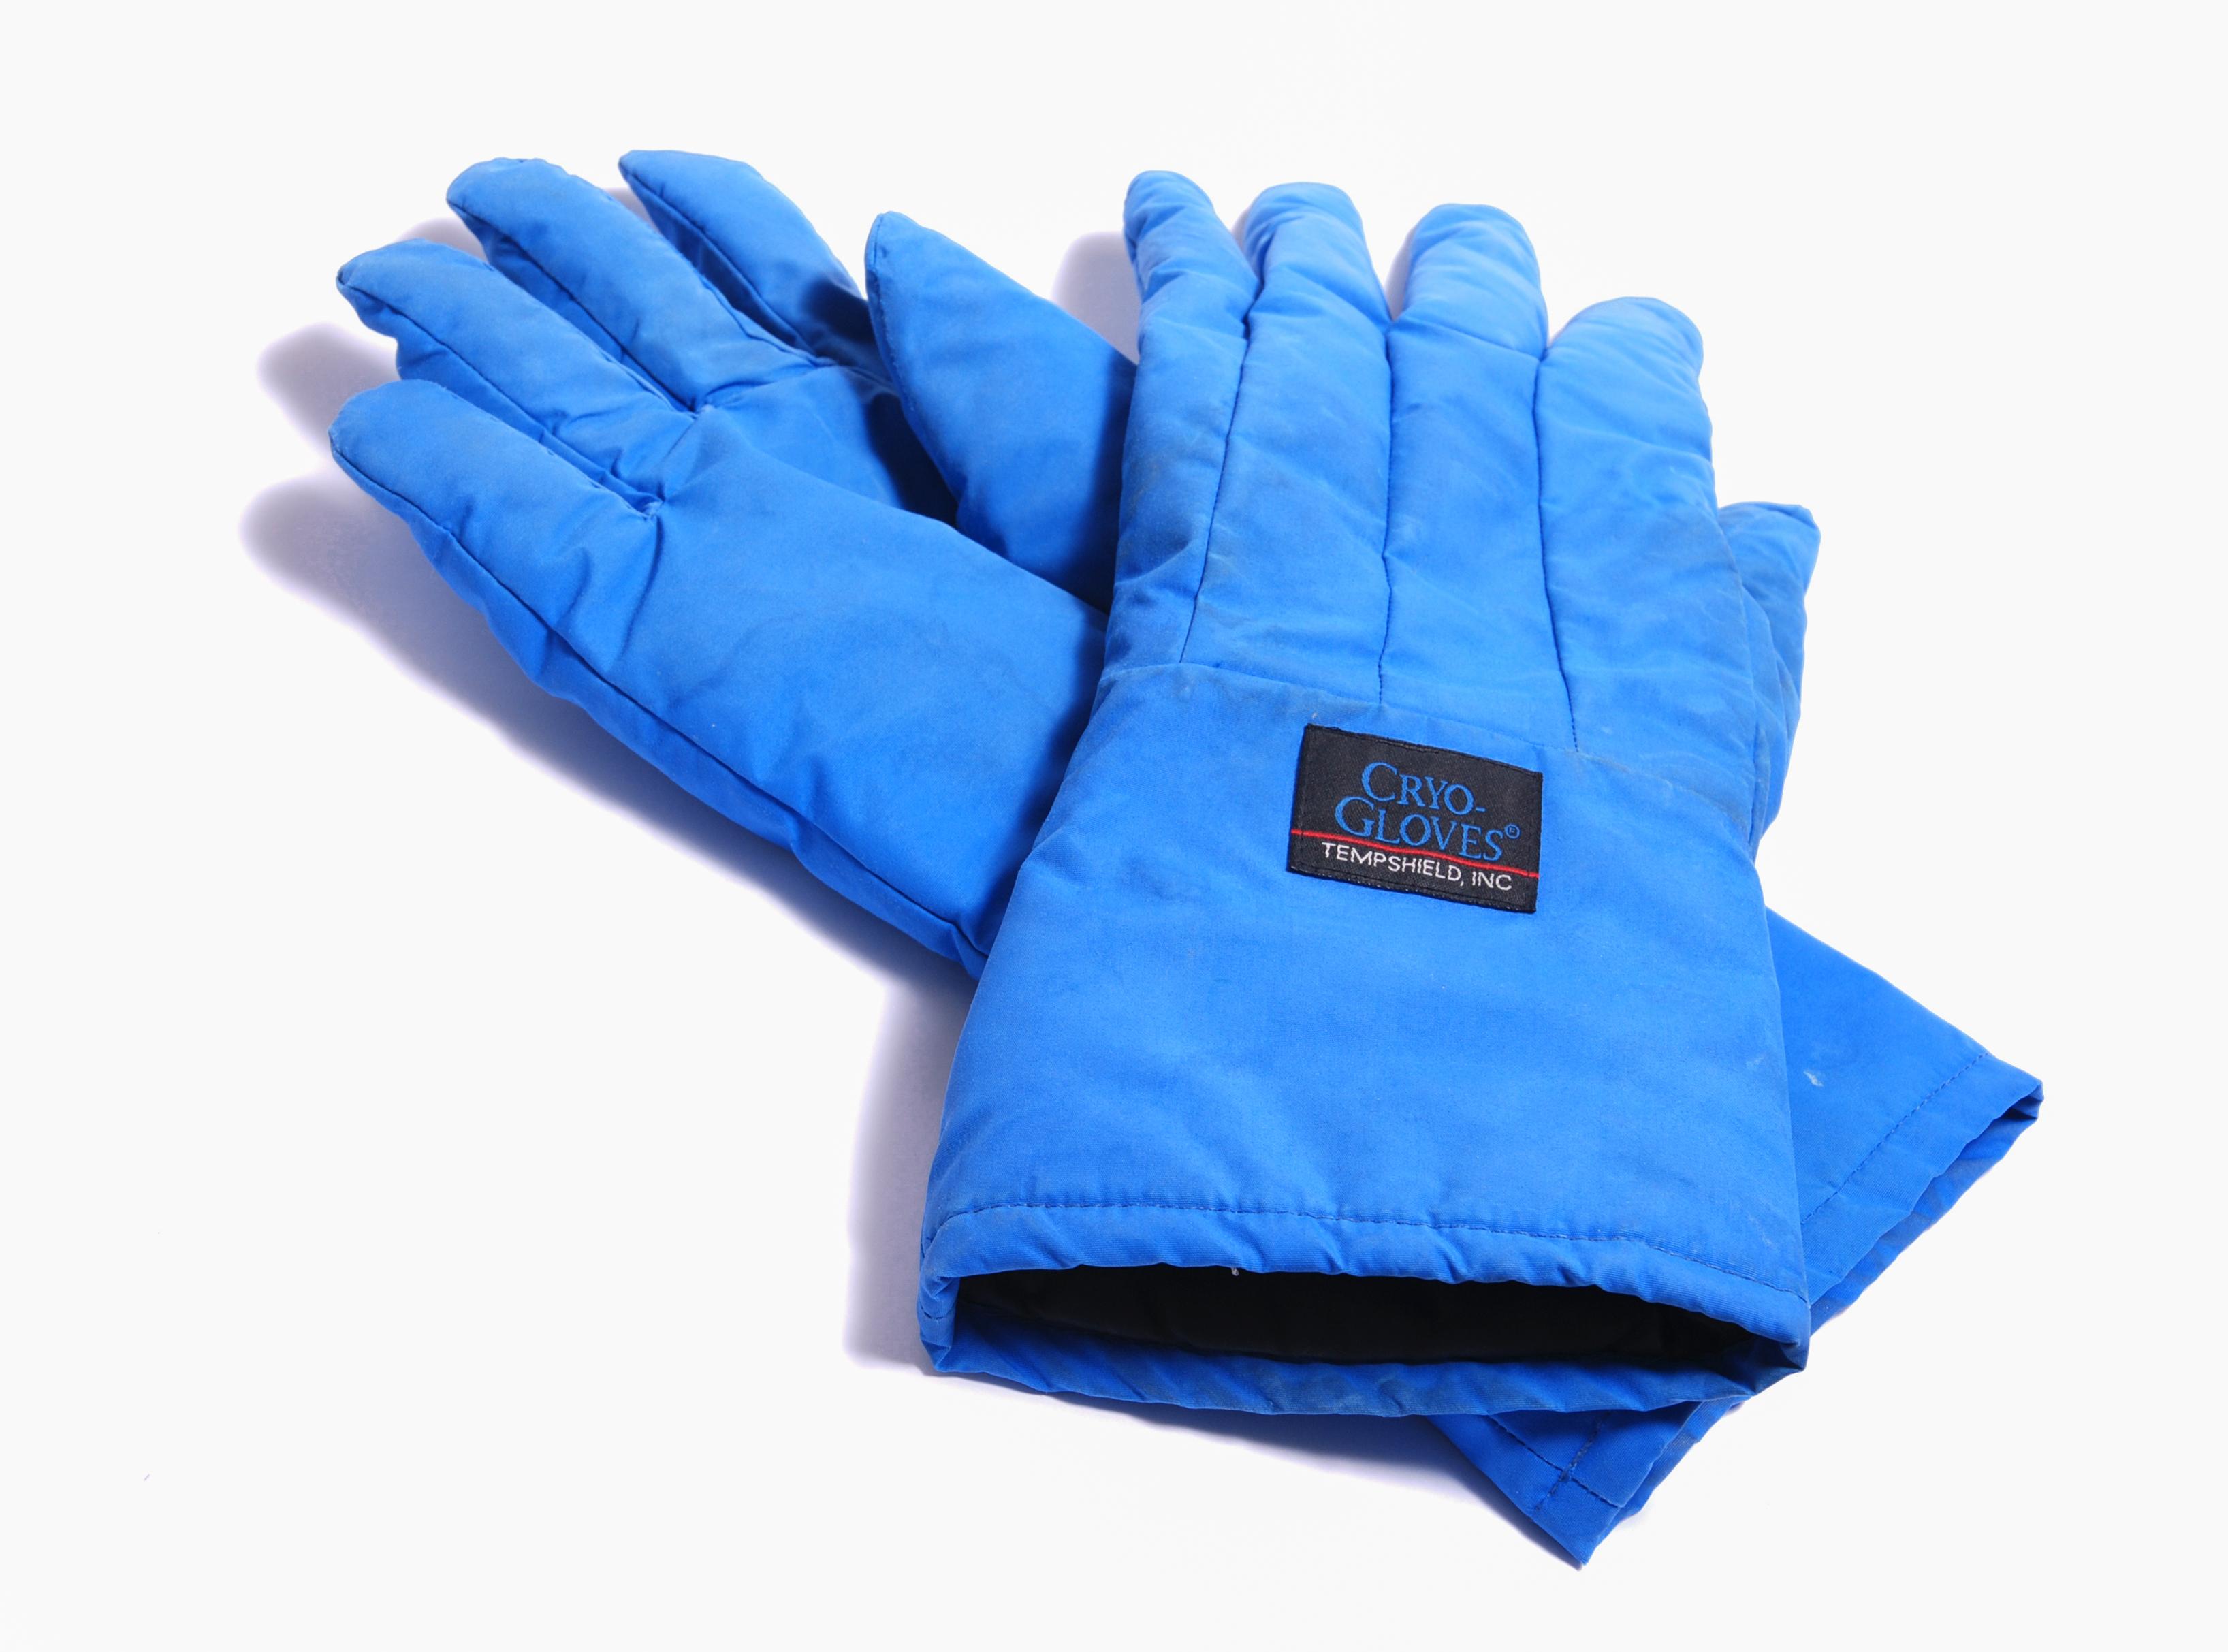 https://upload.wikimedia.org/wikipedia/commons/1/19/Cryo_protecting_gloves.jpg